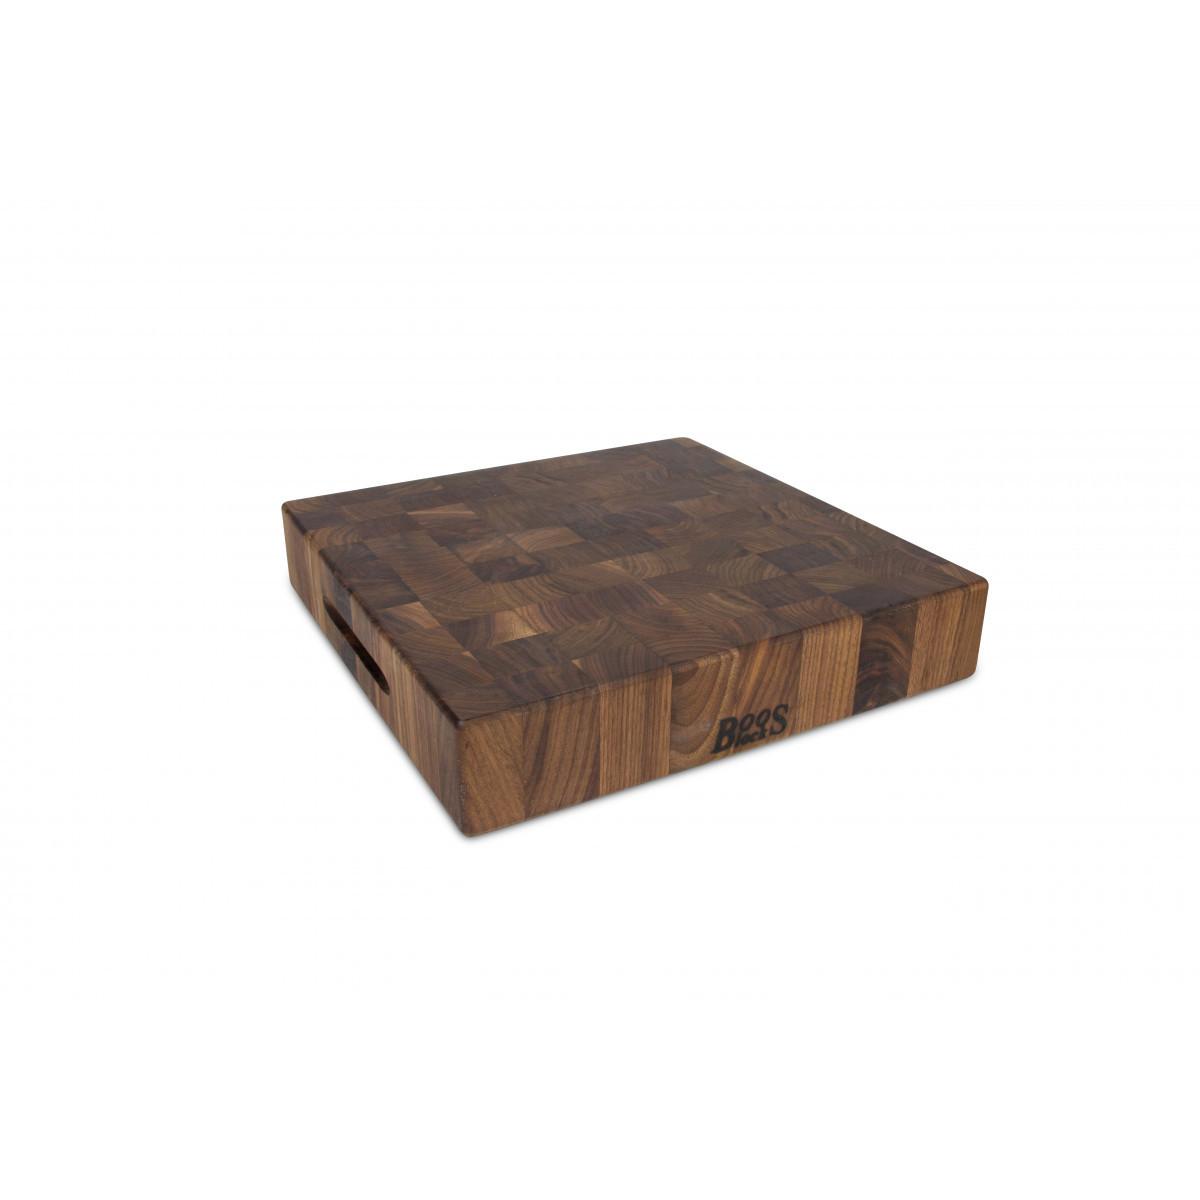 Boos Blocks Black Walnut Hackblock 38x38x7,5 cm / Walnuss-Stirnholz